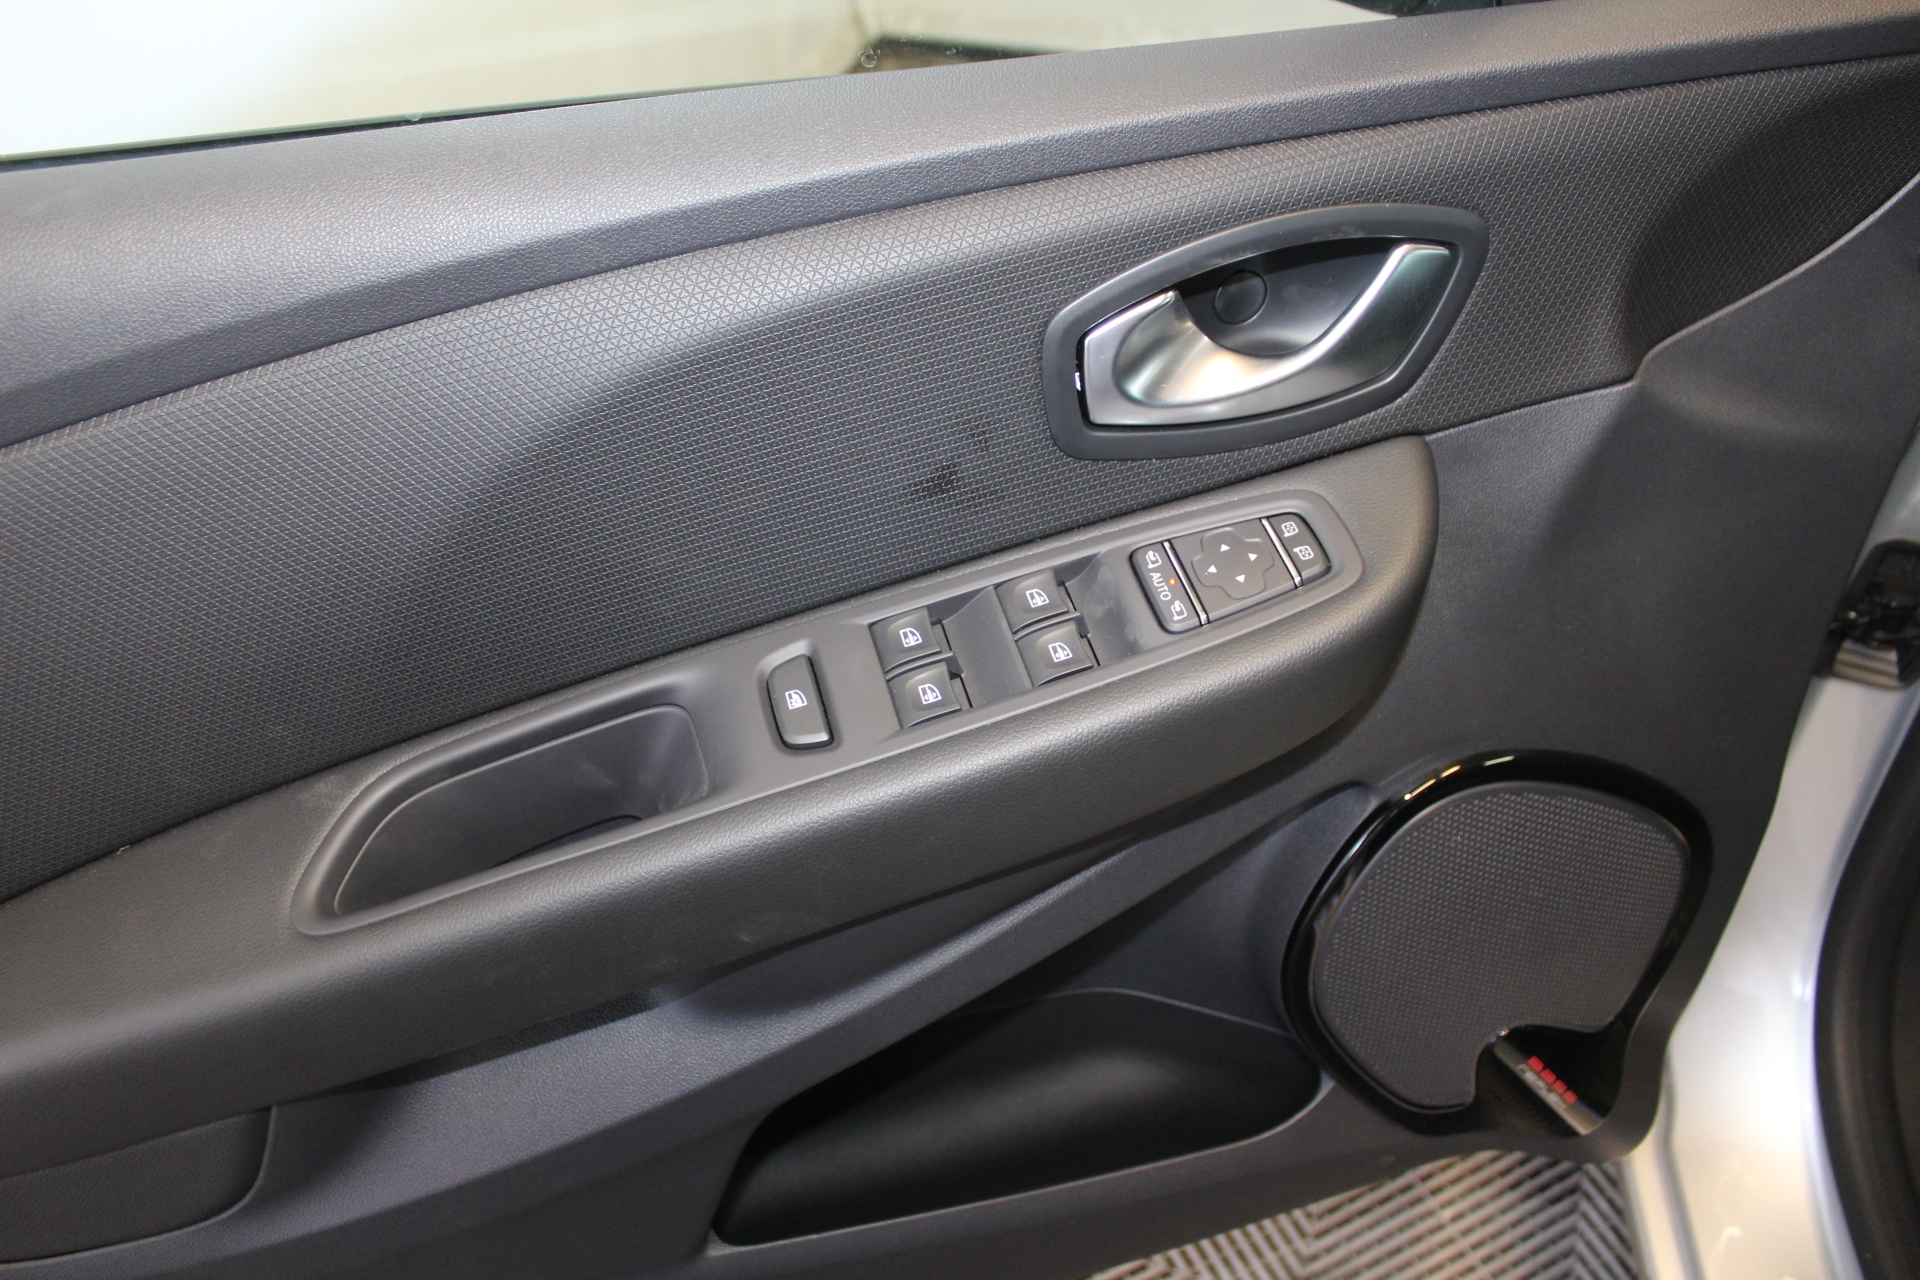 RENAULT CLIO IV 2019 à 13900 € - Photo n°79